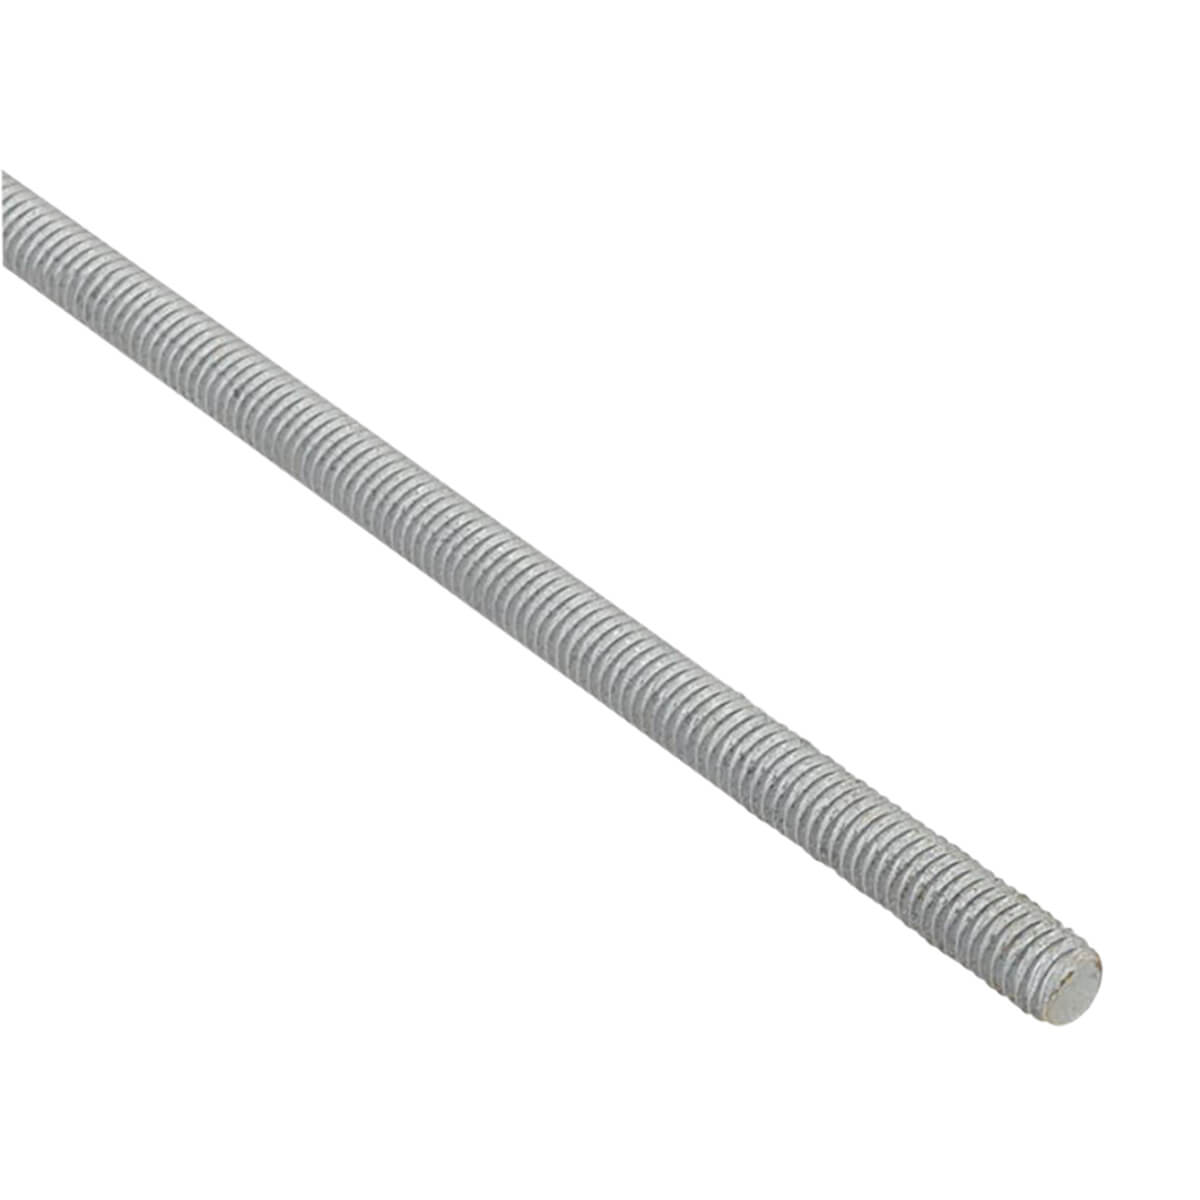 Threaded Rod - Galvanized Steel - 3/8-in-16 - 36-in